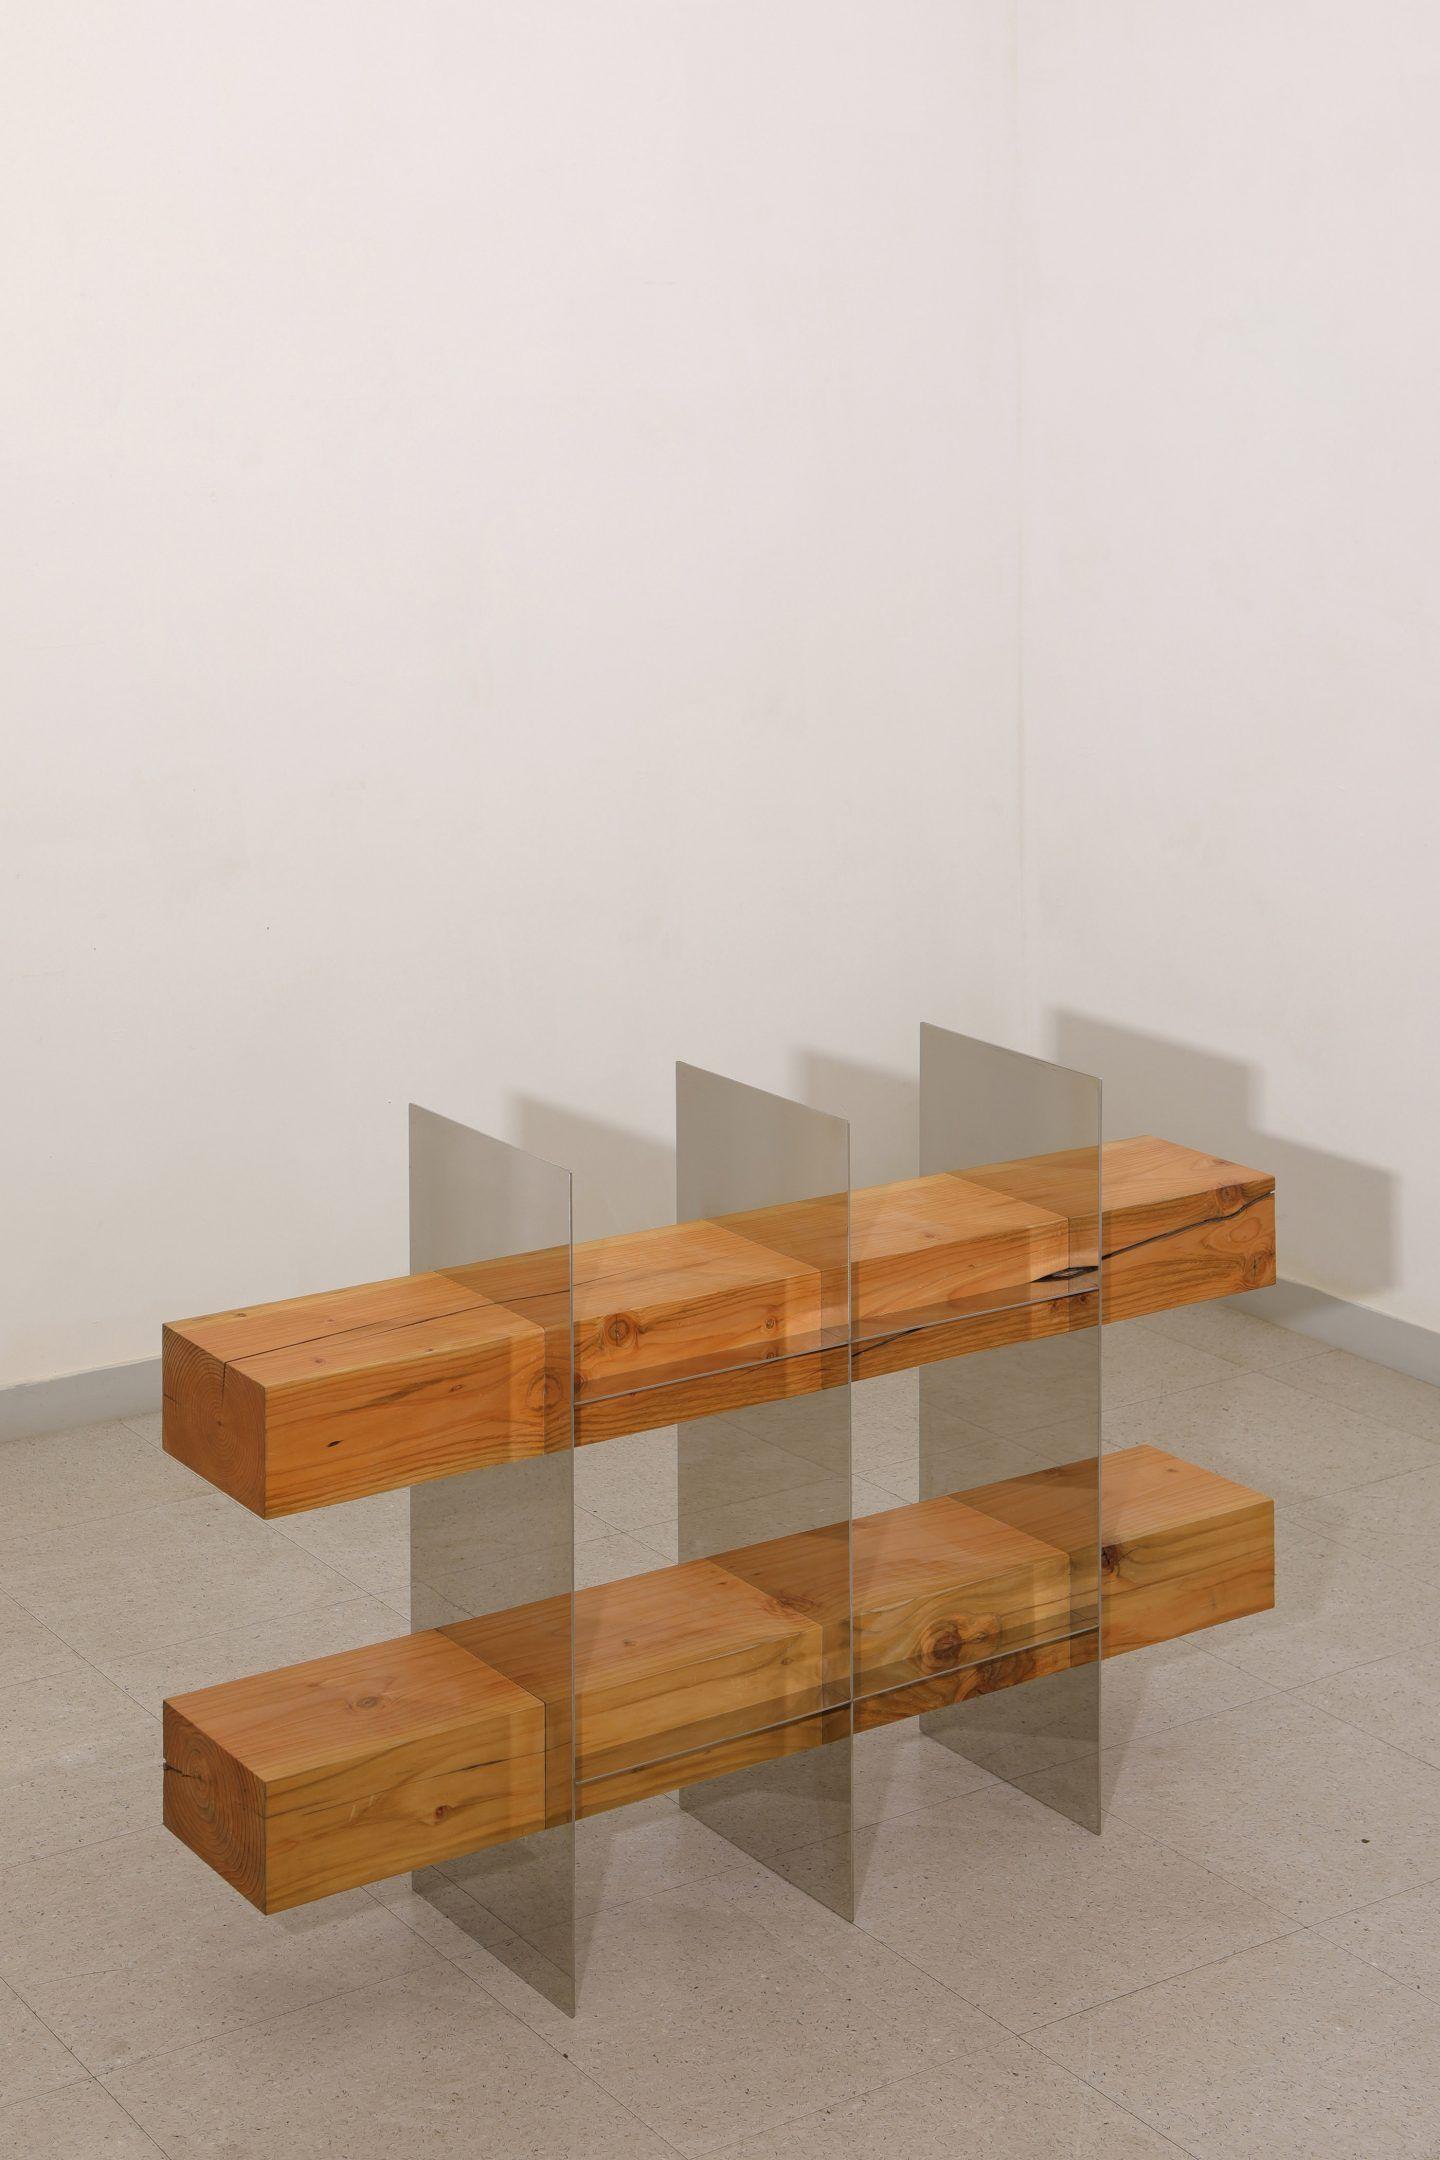 IGNANT-Design-Shinkyu-Shon-Split-Collection-010